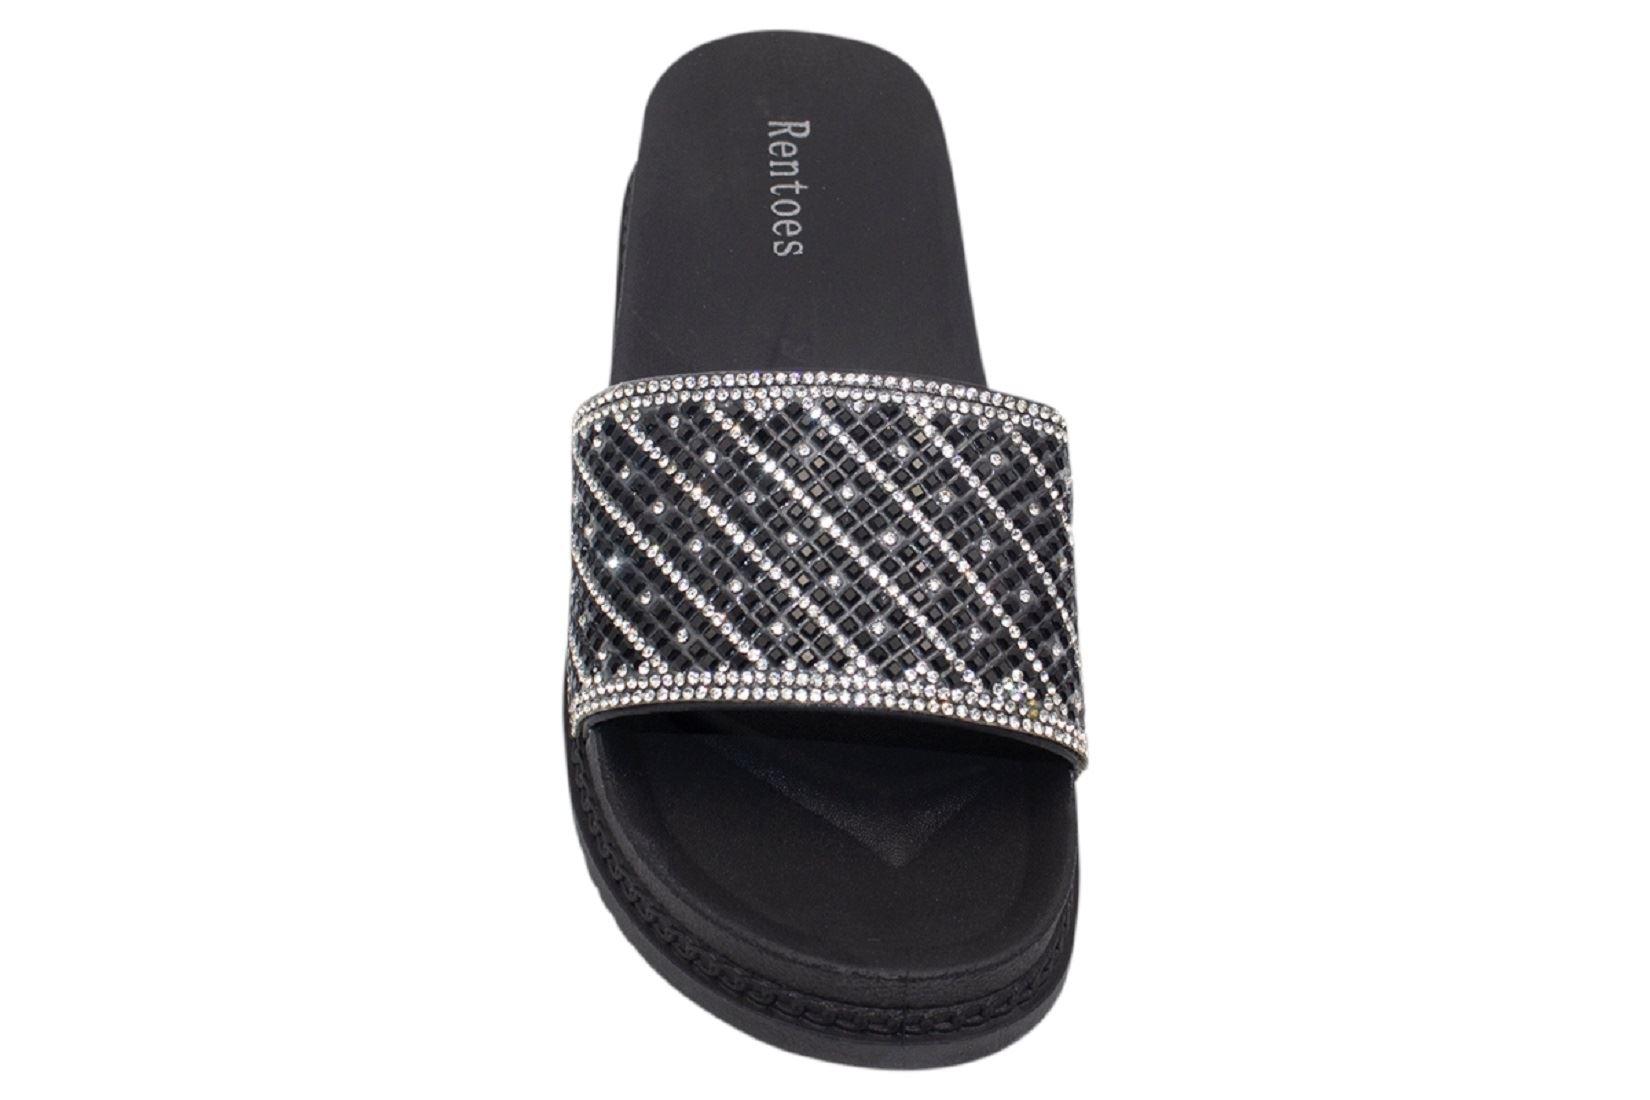 Womens-Sliders-Casual-Slippers-Mules-Ladies-Diamante-Flip-Flop-Sandals-Shoes thumbnail 22